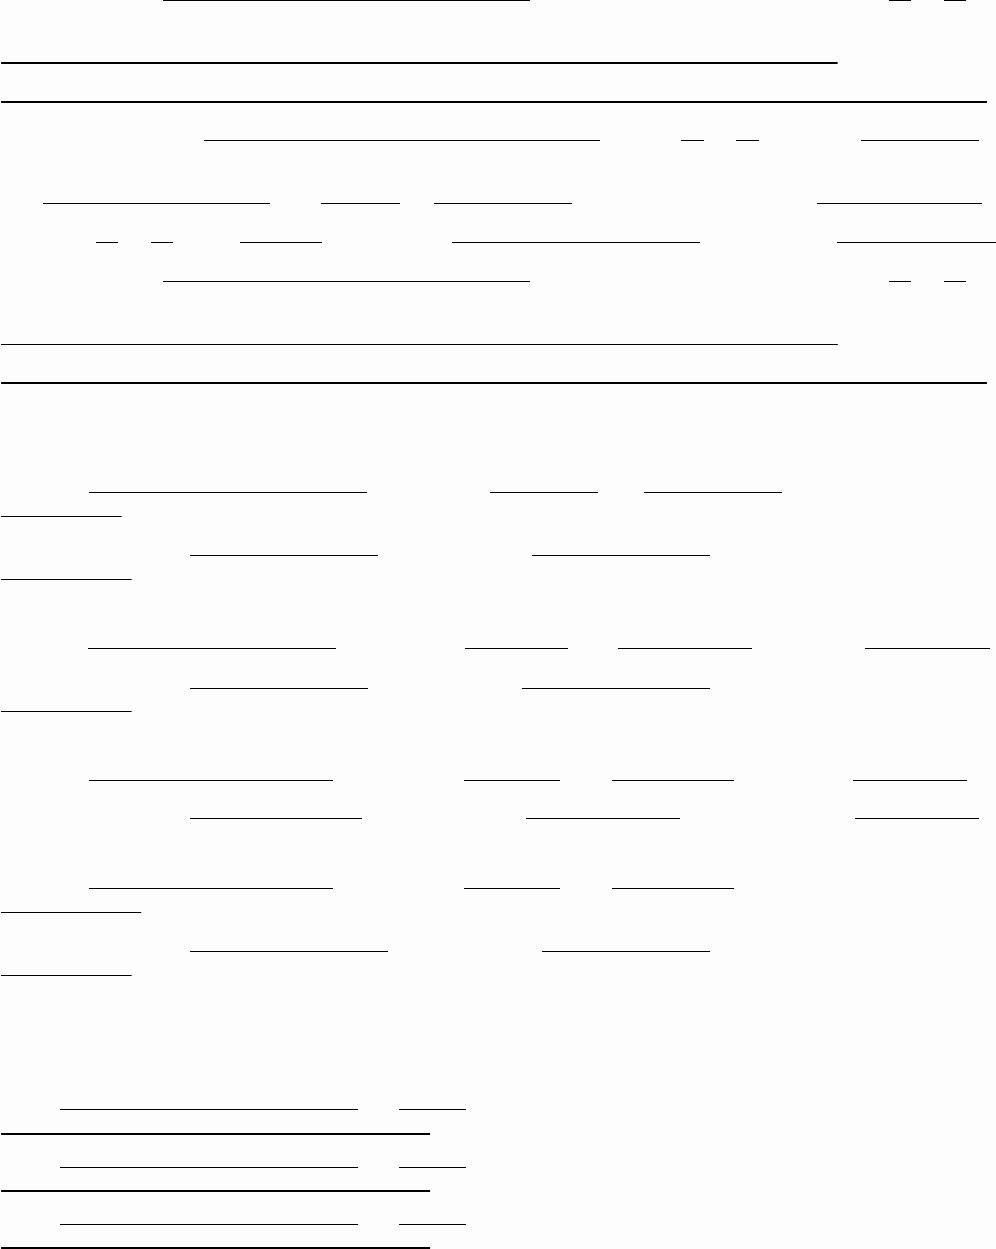 Rental Application form Nc Unique Download north Carolina Rental Application for Free